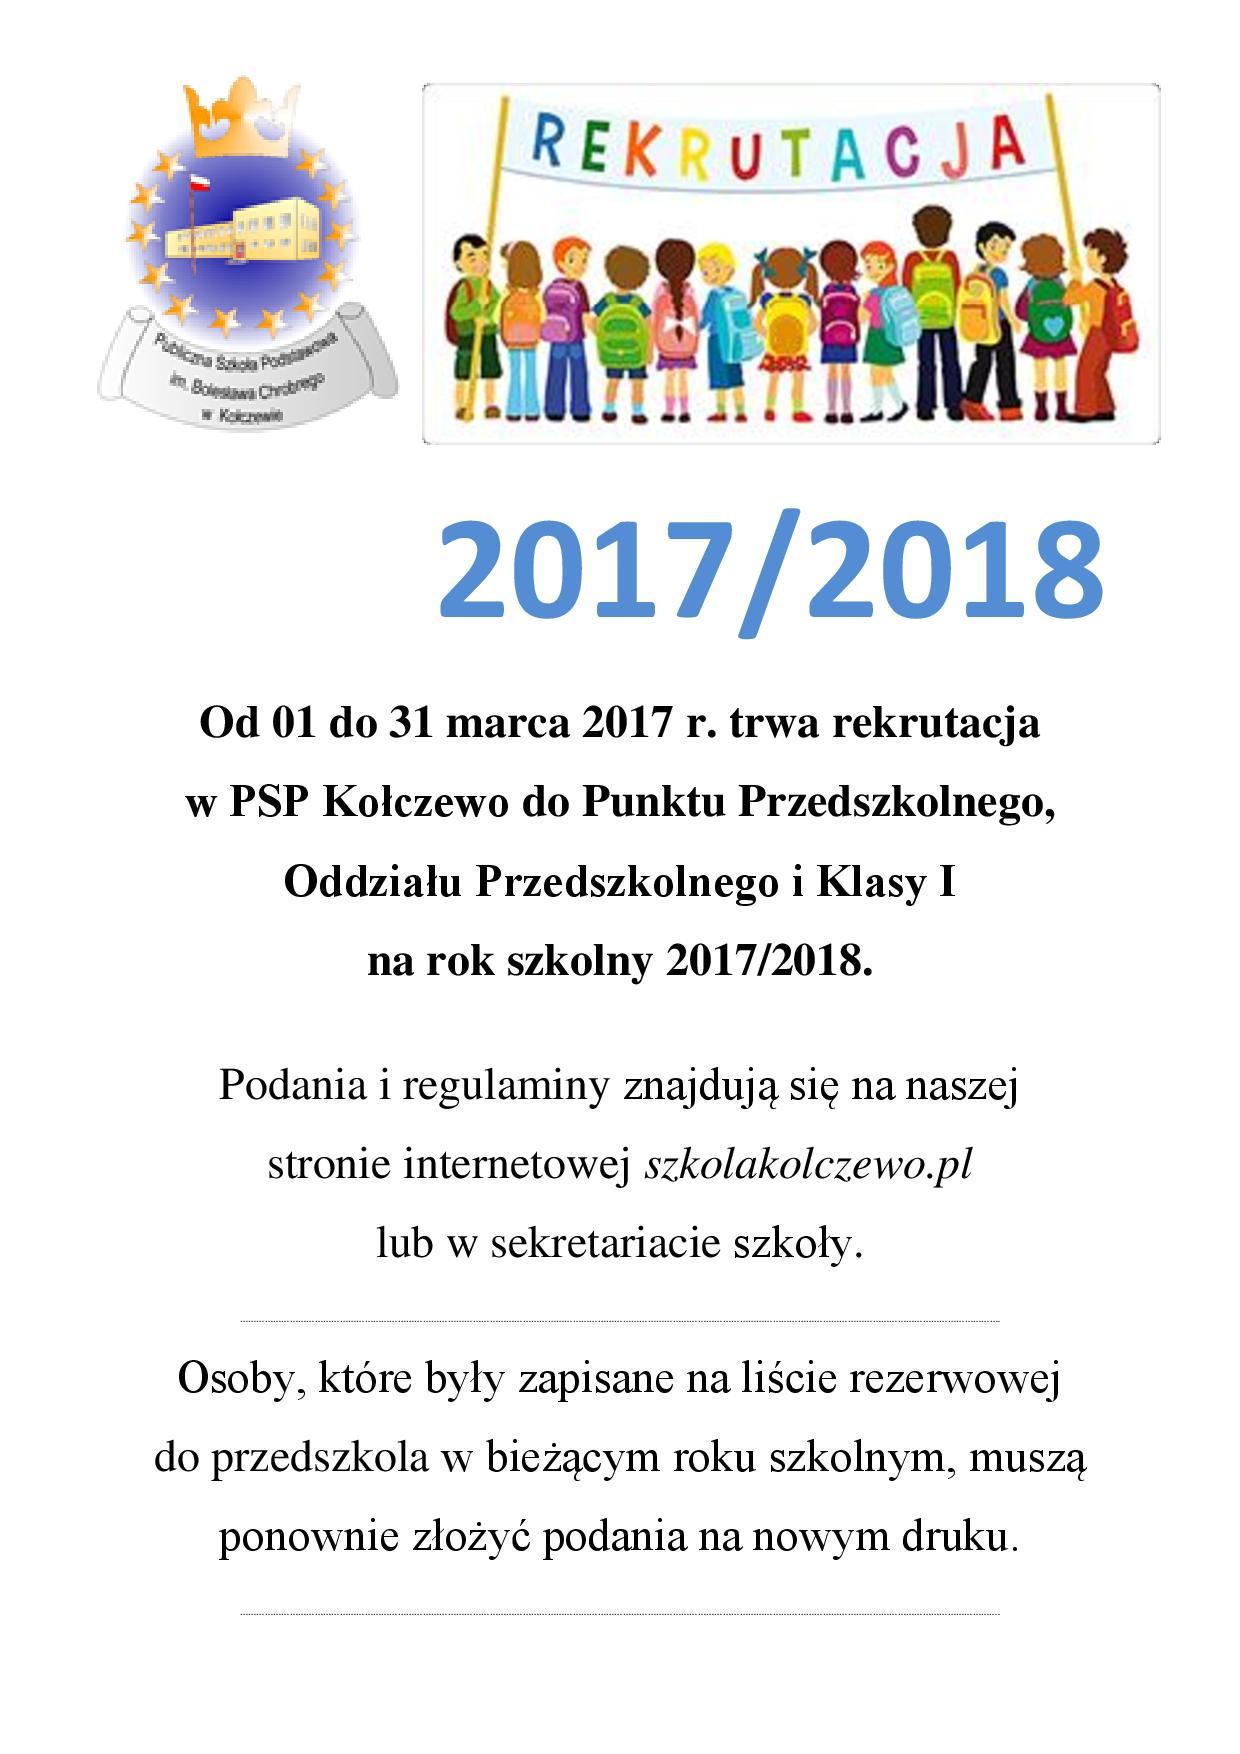 Rekrutacja 2017/18